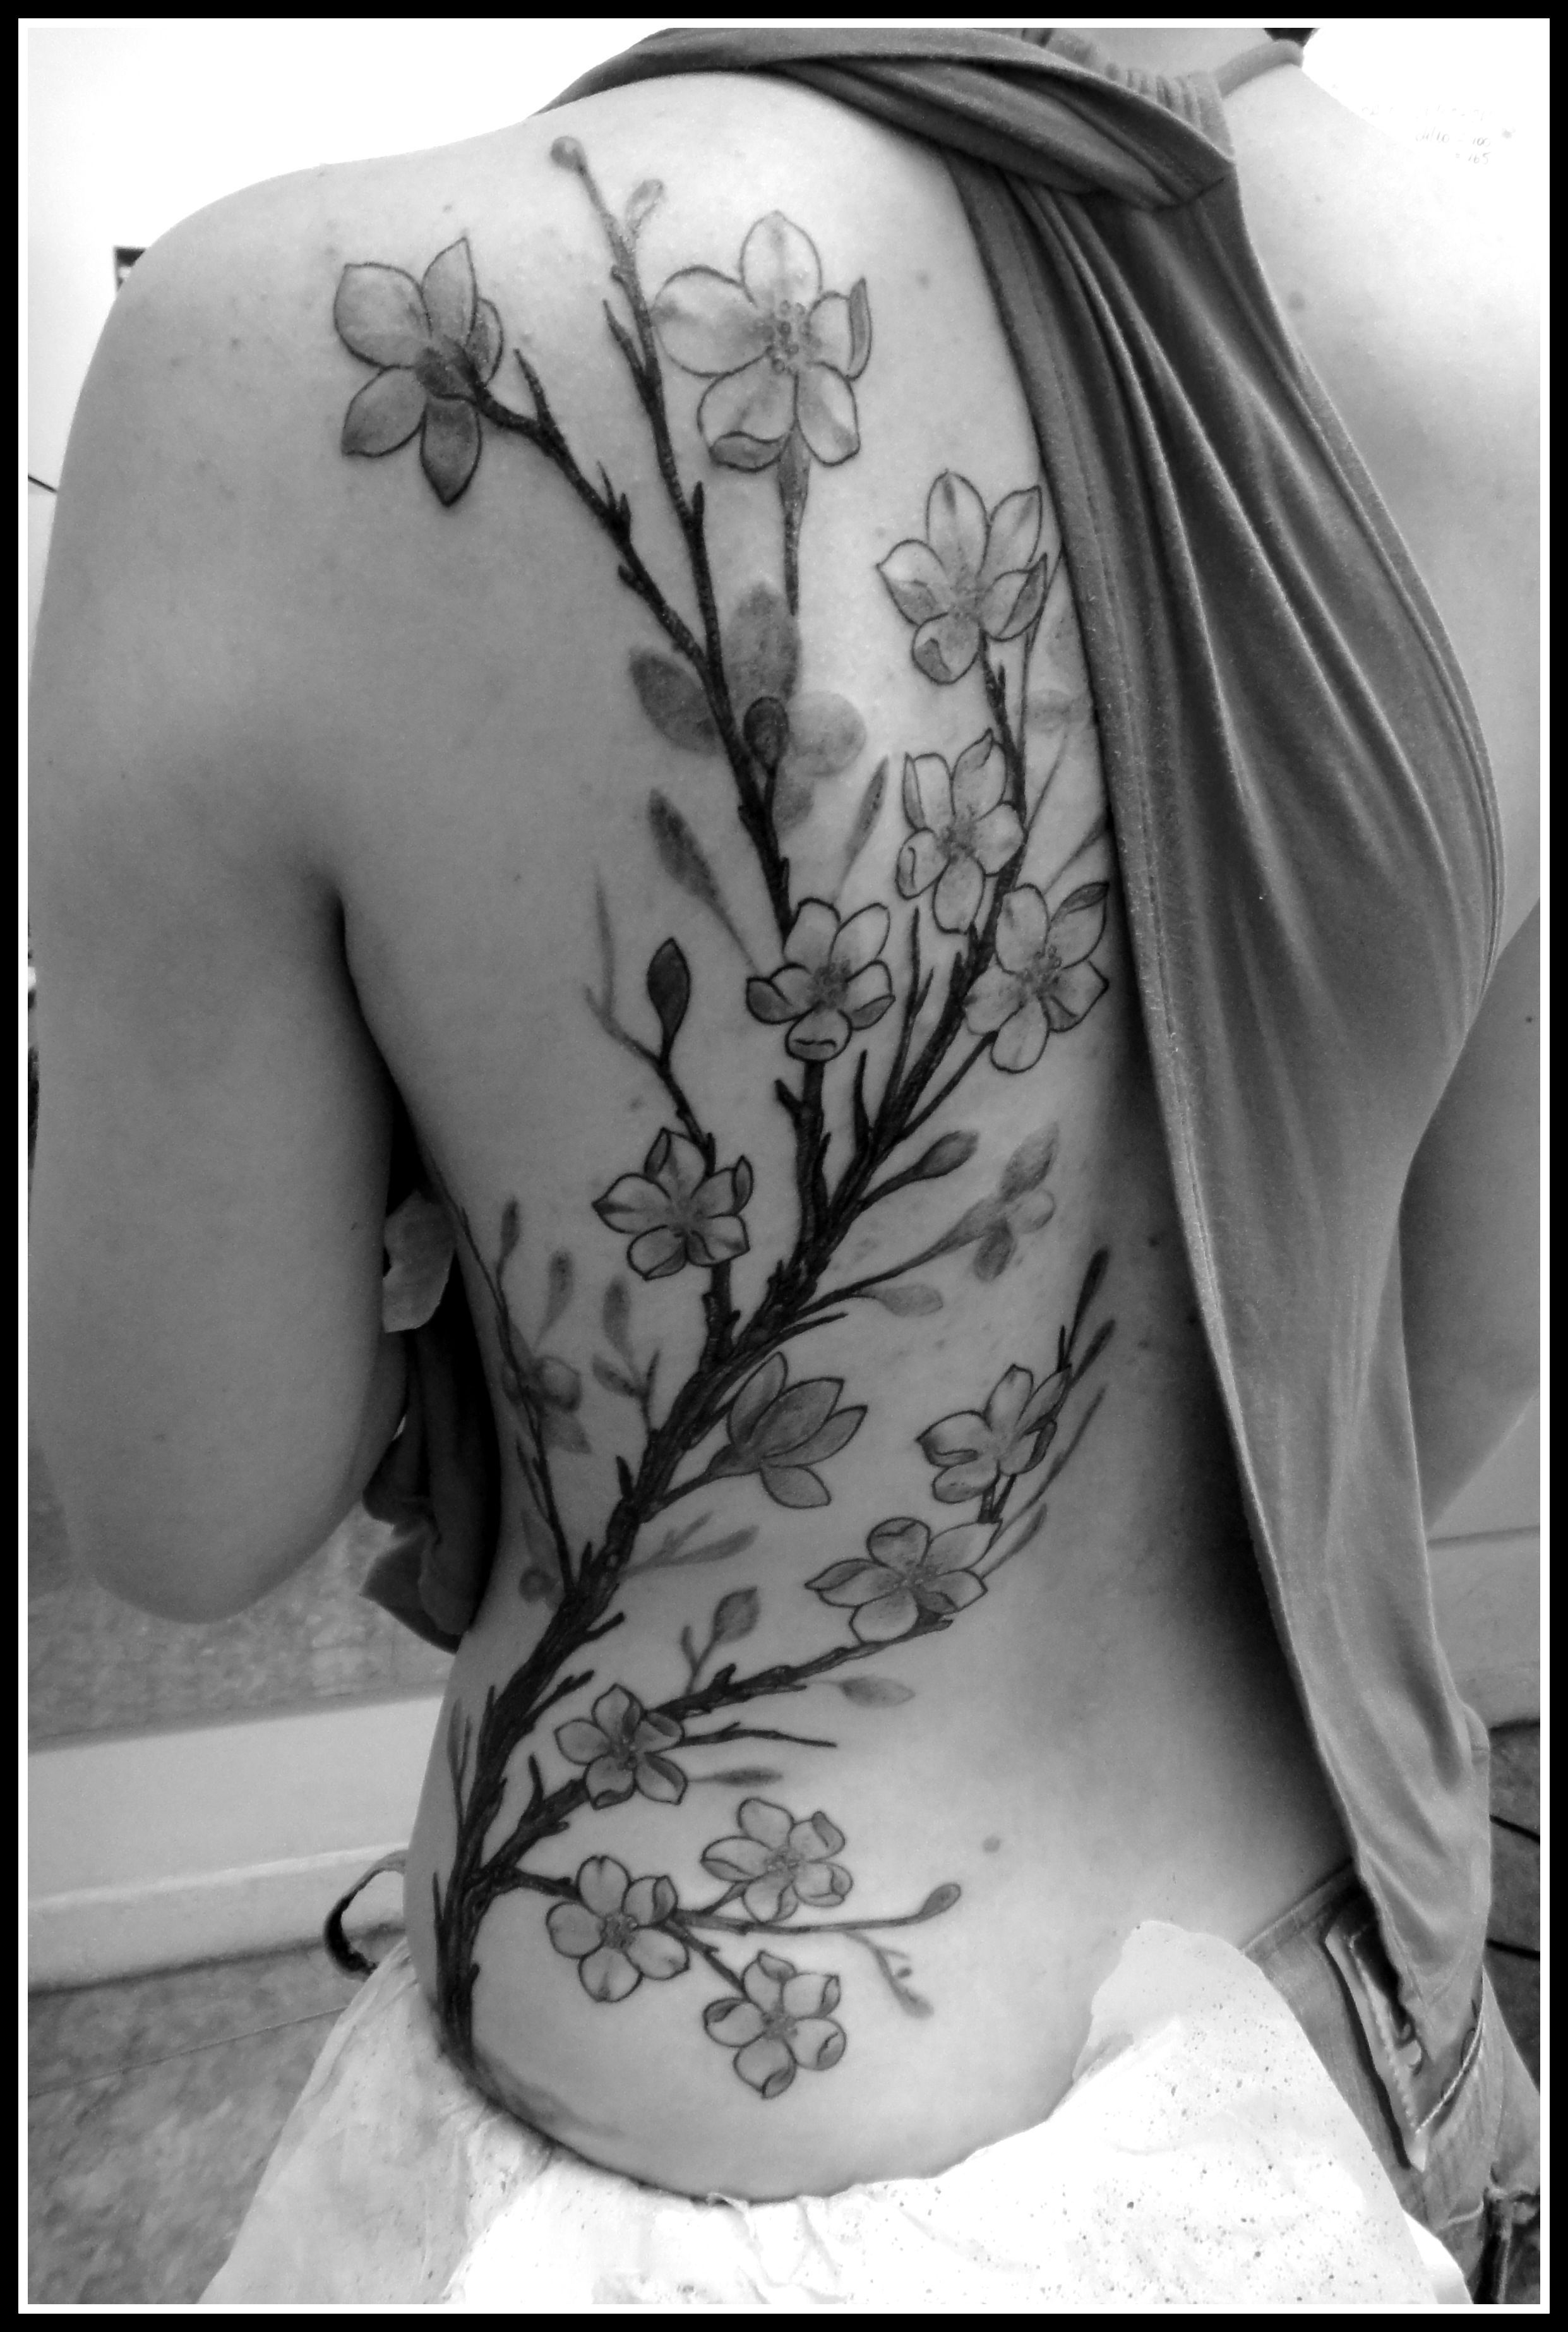 Tree Tattoo Tattoo Sakura Blackandgrey Back Tree Tattoo Tattoo Sakura Blackandgrey Back Tree Tattoo Back Cherry Tree Tattoos Tree Tattoo Arm